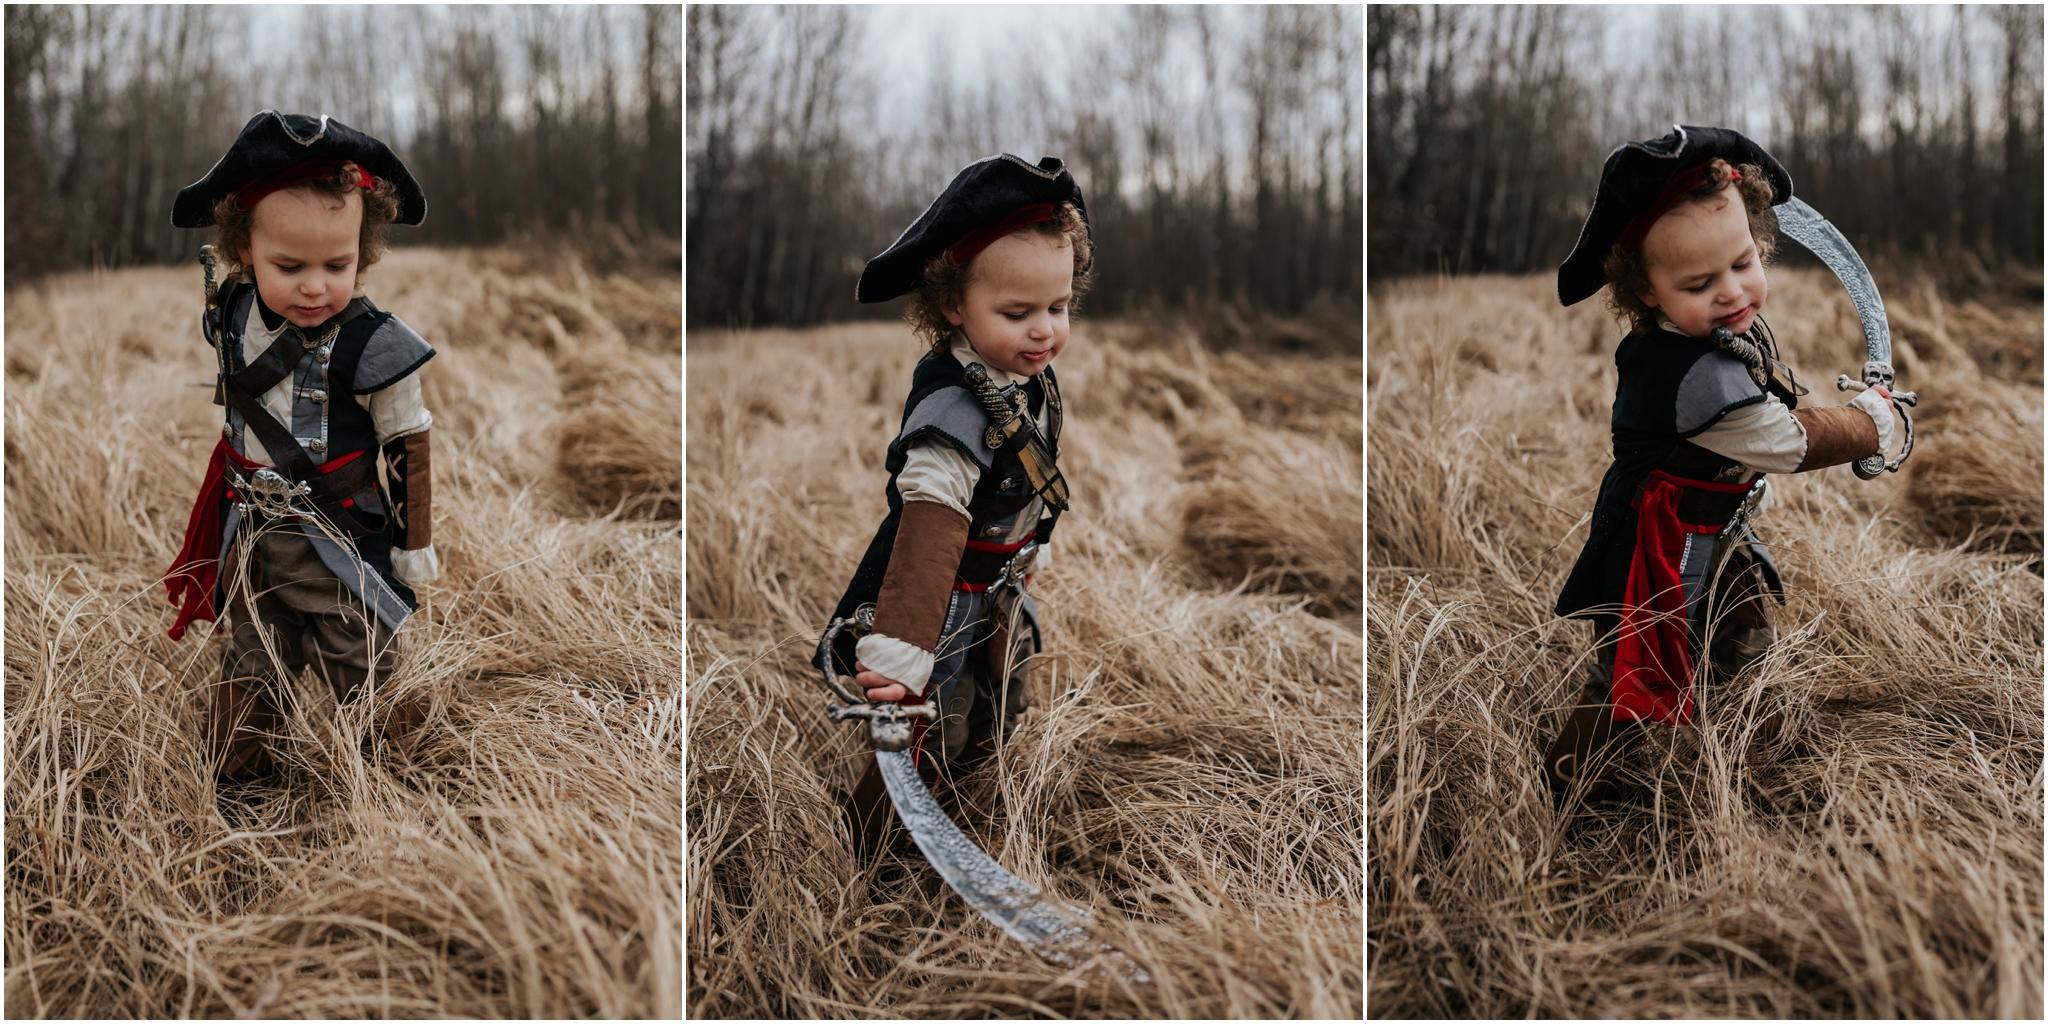 Edmonton Lifestyle Photographer - Costume dress-up halloween 2017